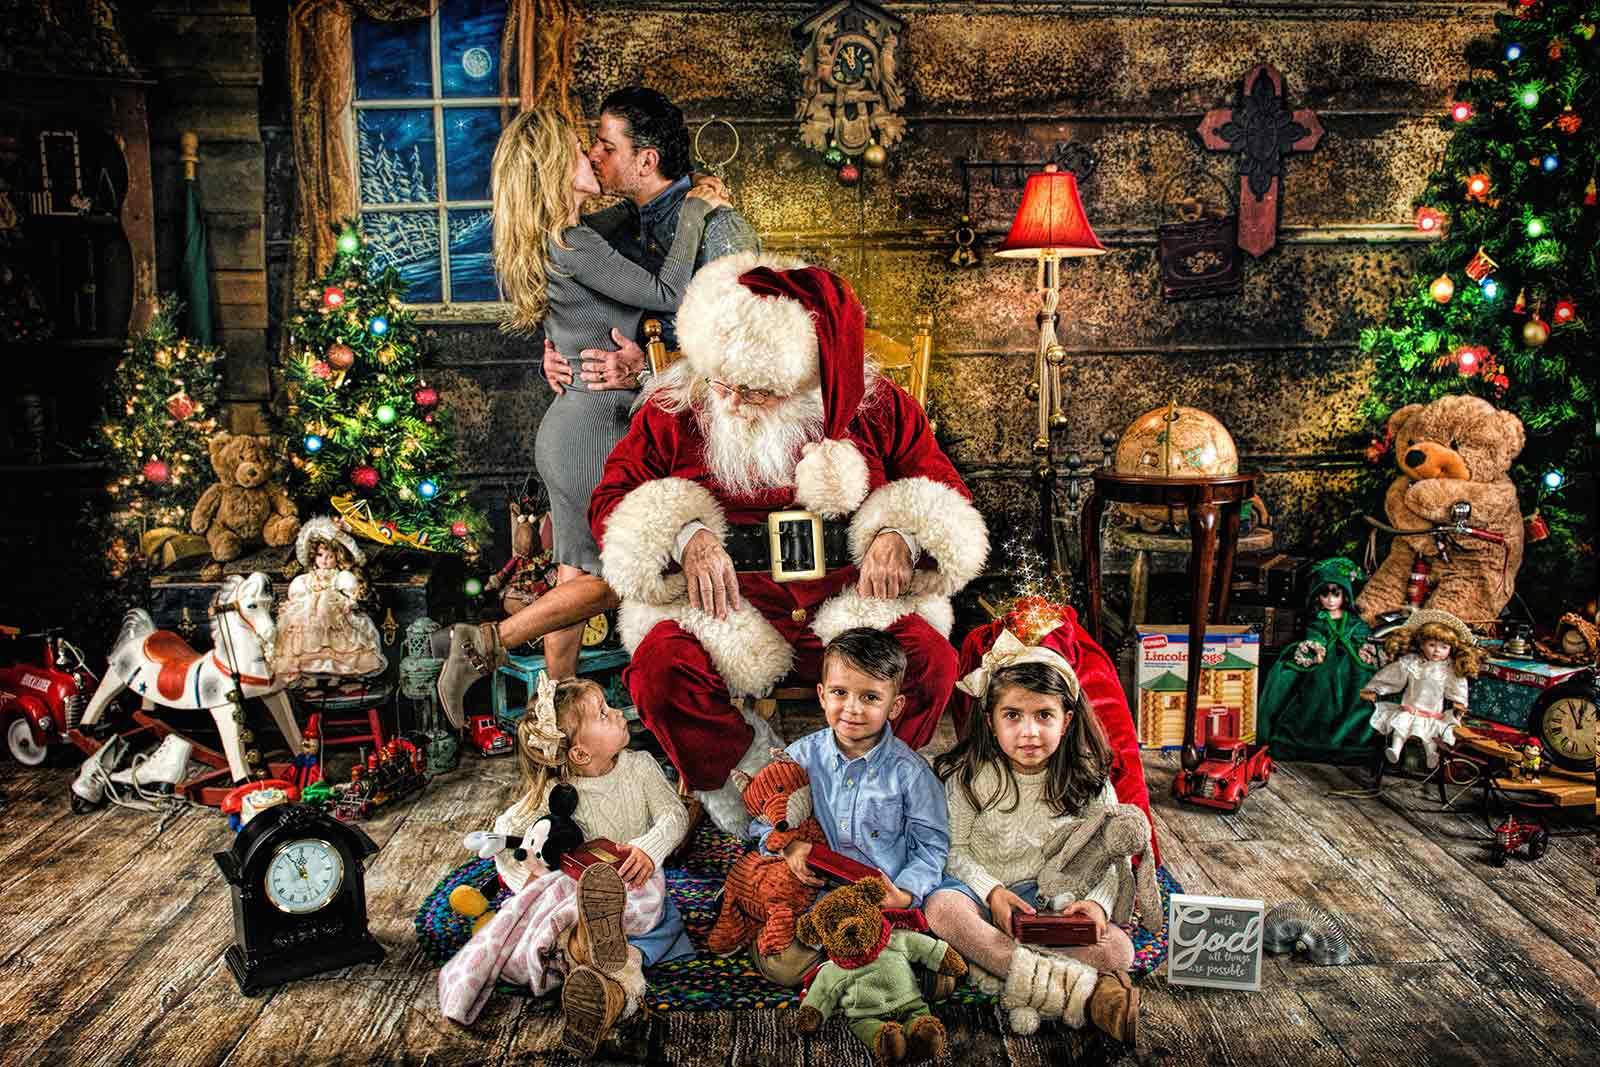 025_Magic-of-Santa-Anna-Thielen-Photography